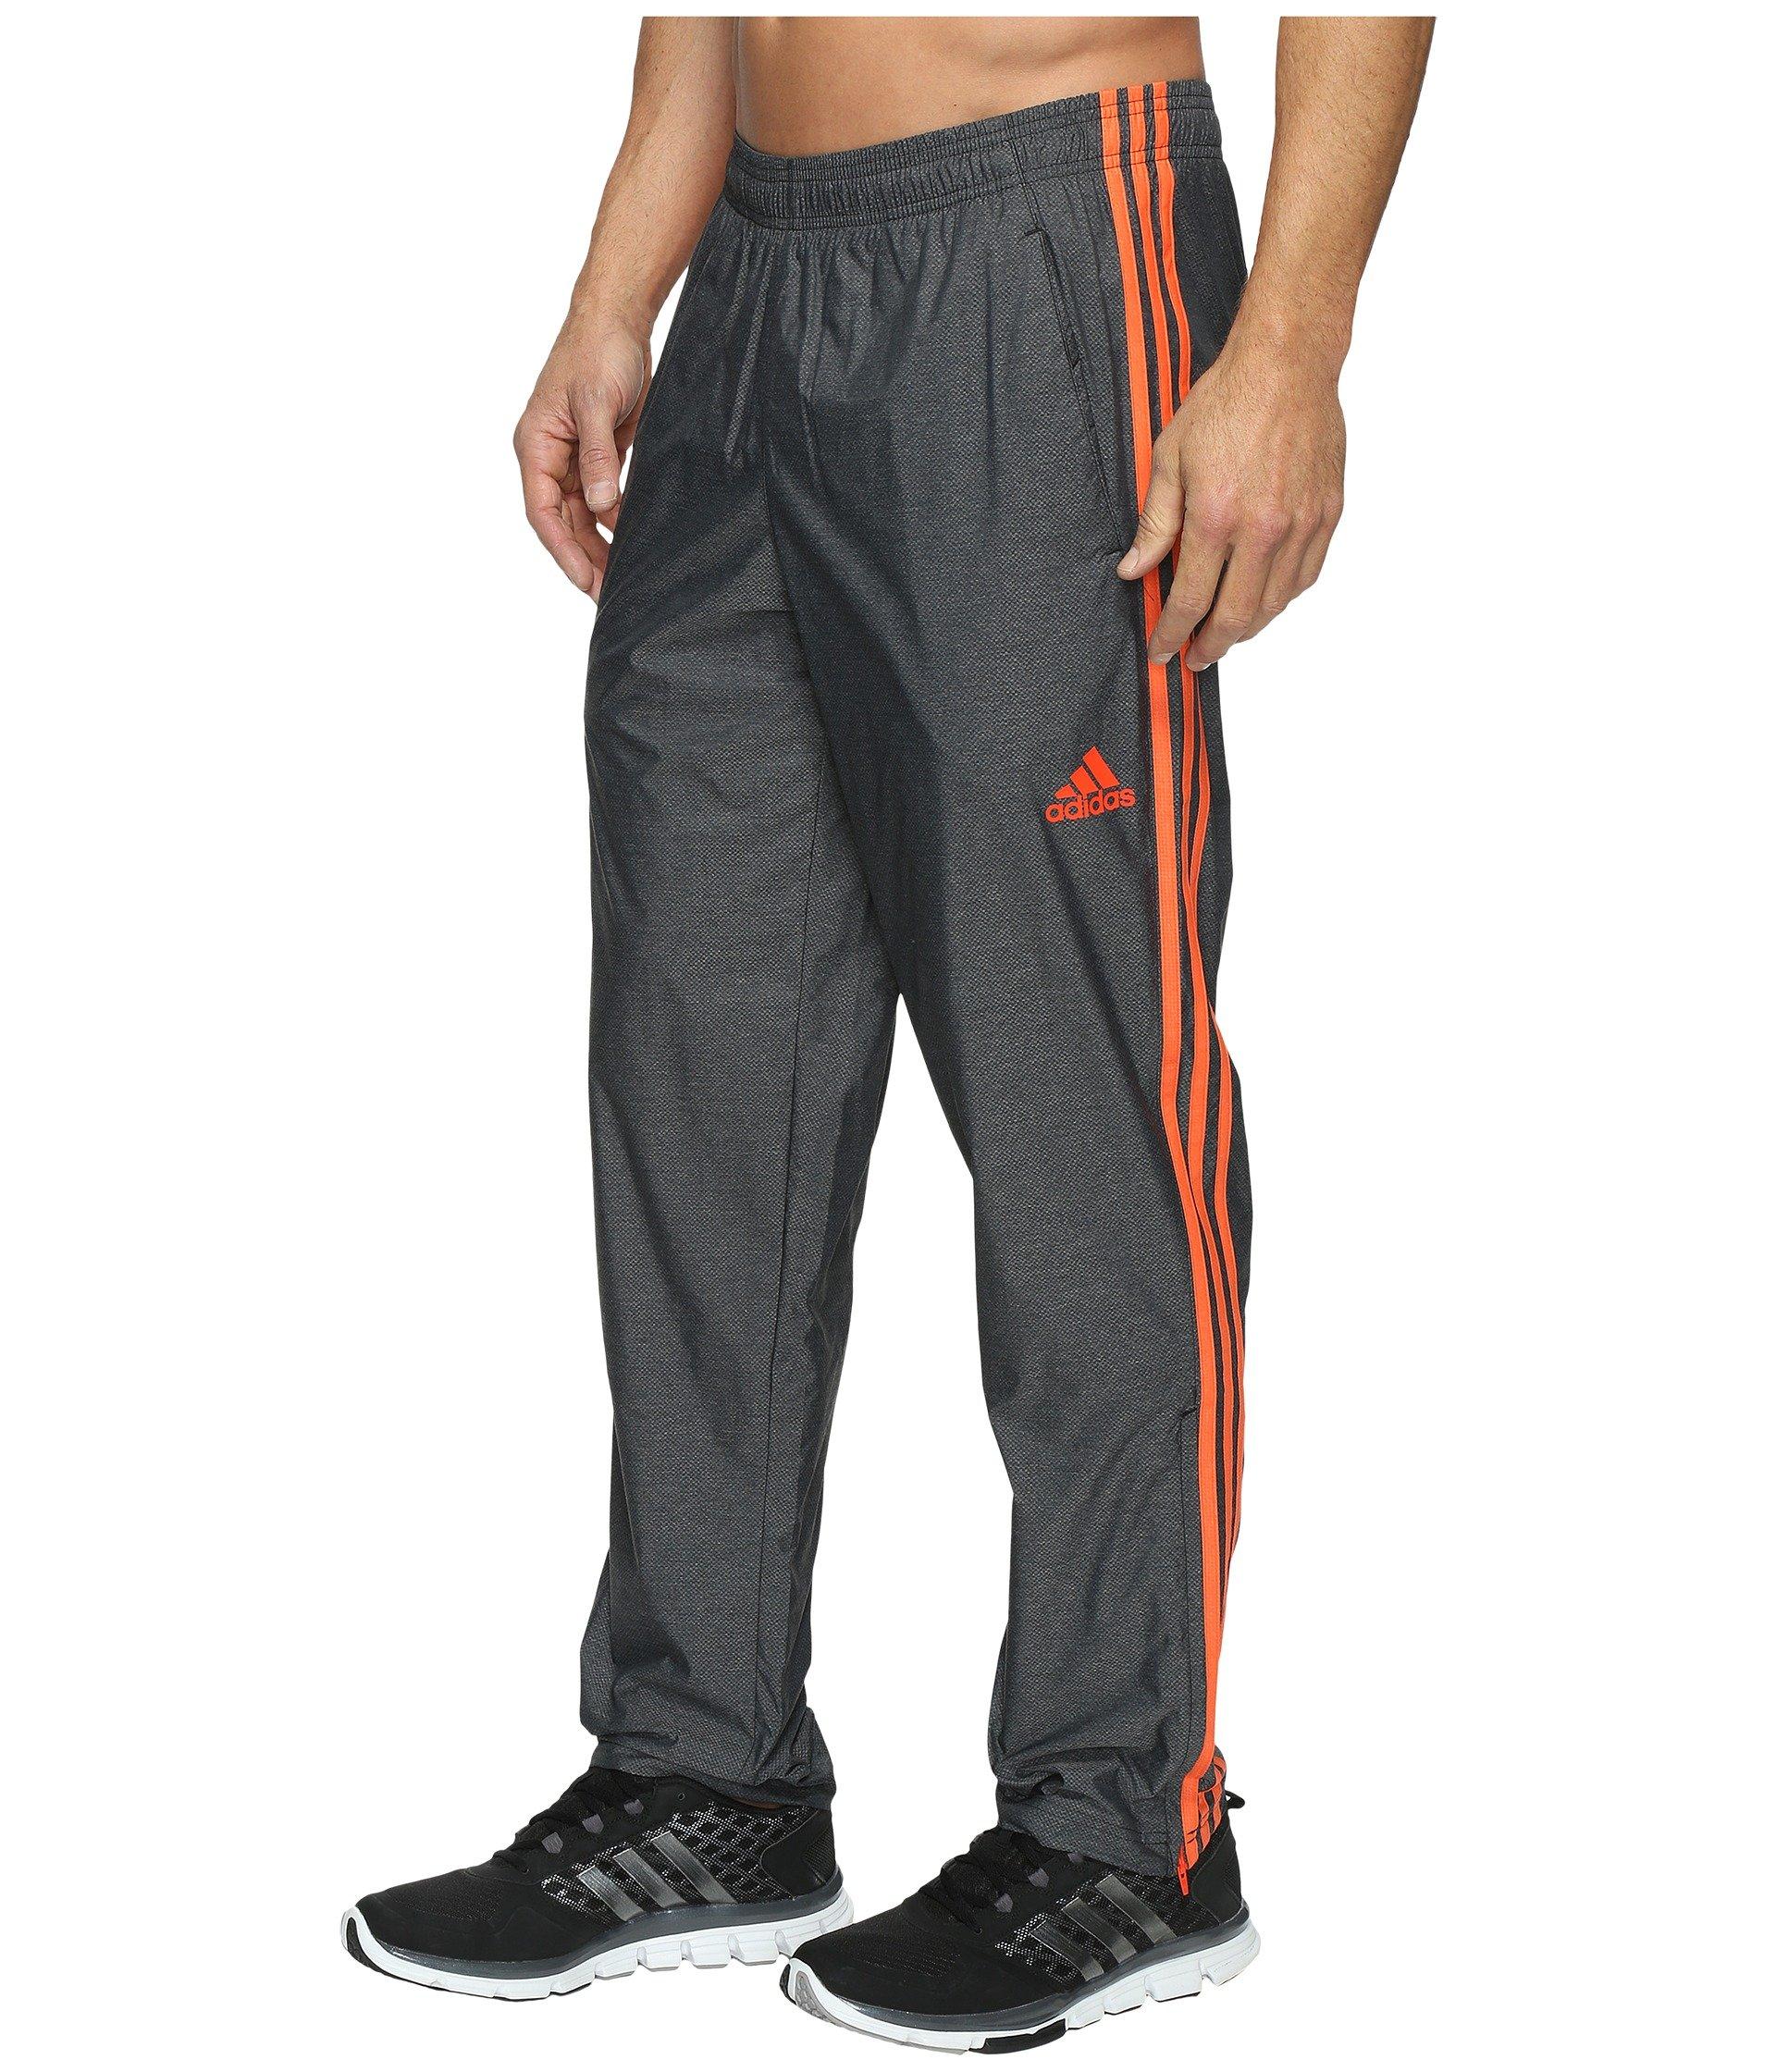 adidas Men's Athletics Essential Pants, Black/Energy, XX-Large by adidas